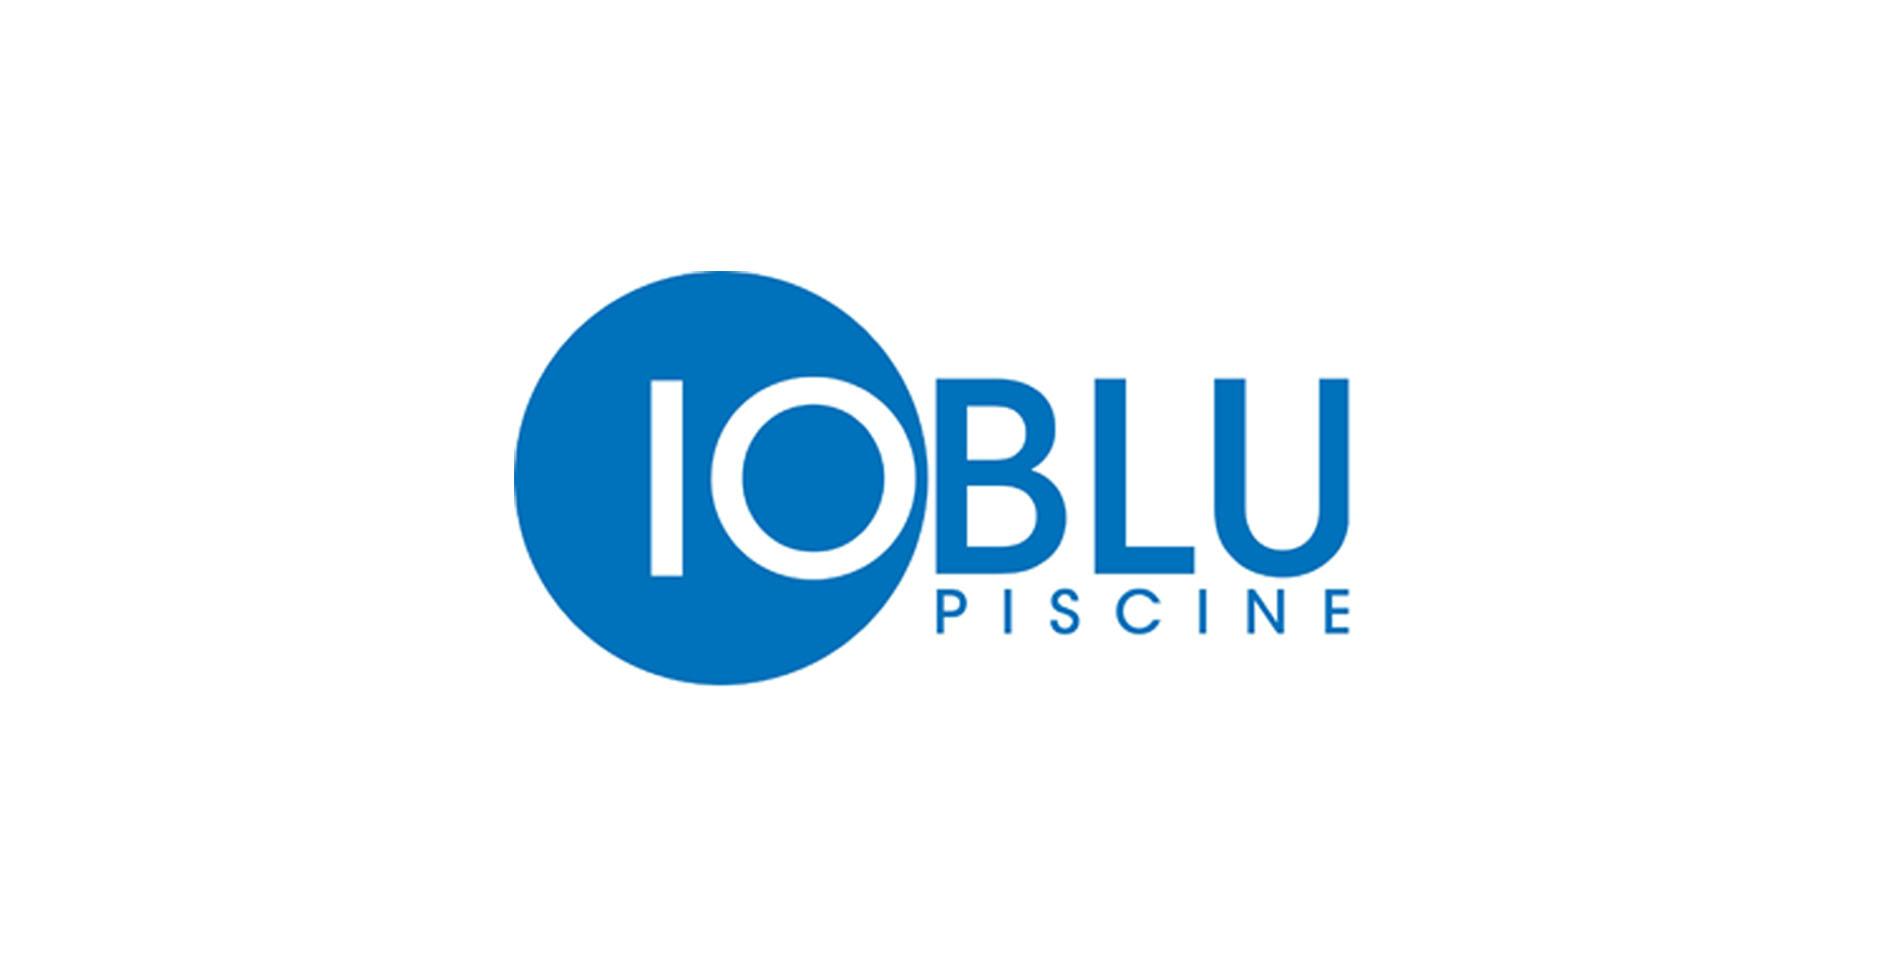 Ioblu Piscine